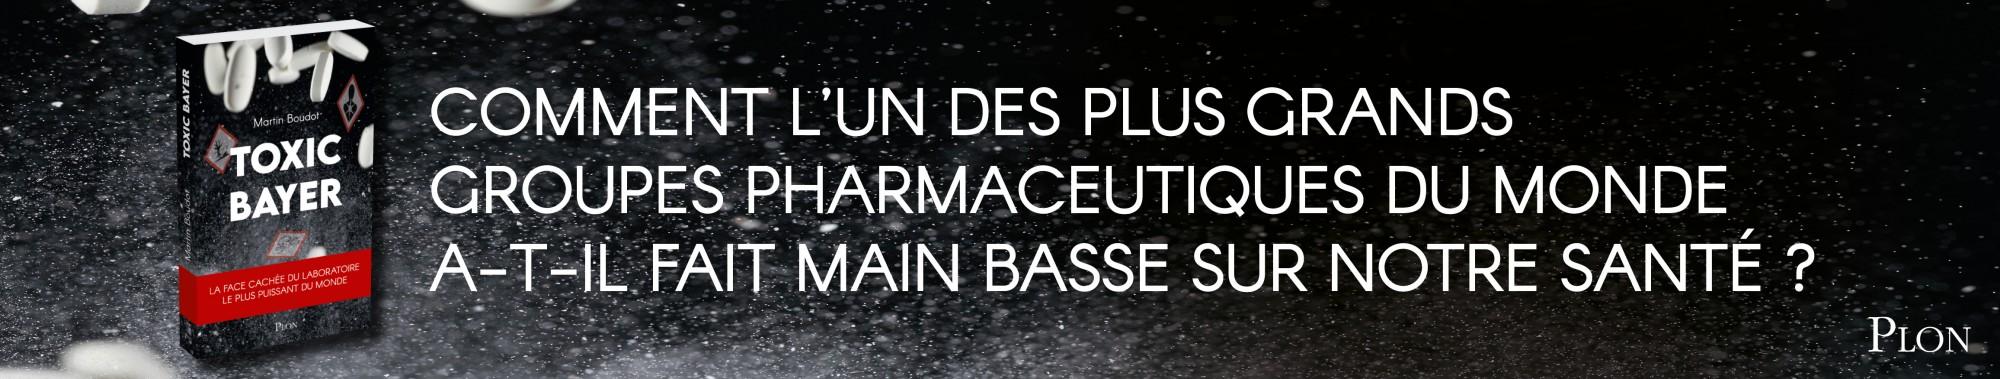 Toxic Bayer - Plon